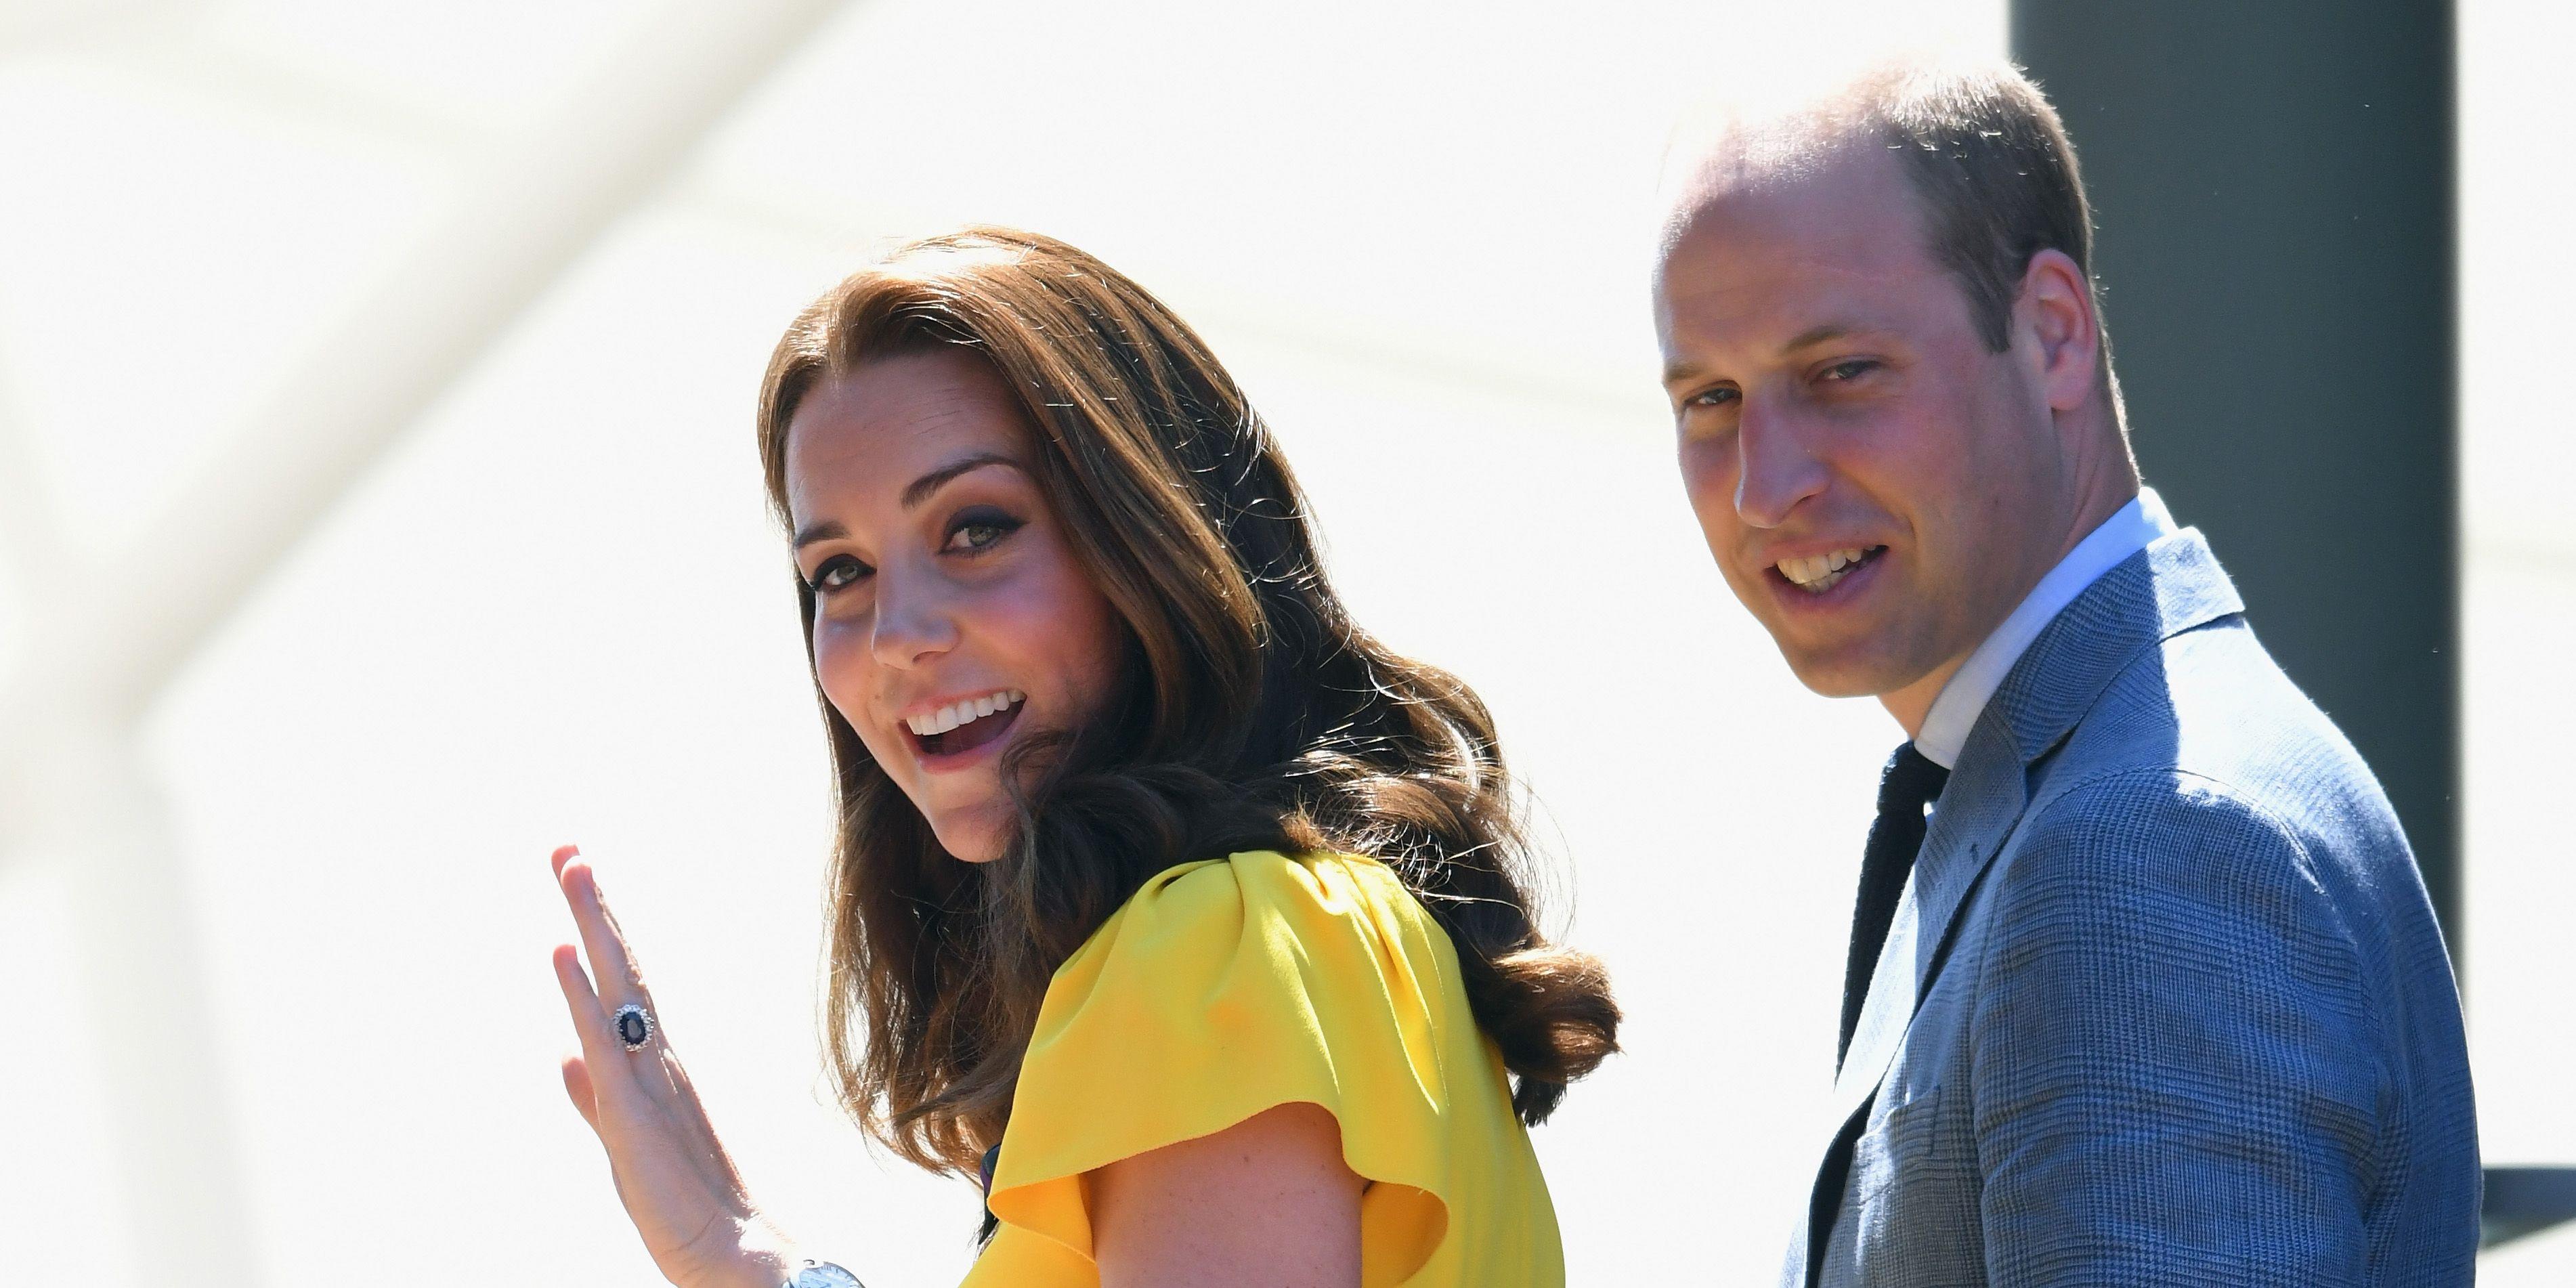 Kate Middleton Channels Meghan Markle in Dolce Gabbana at Wimbledon